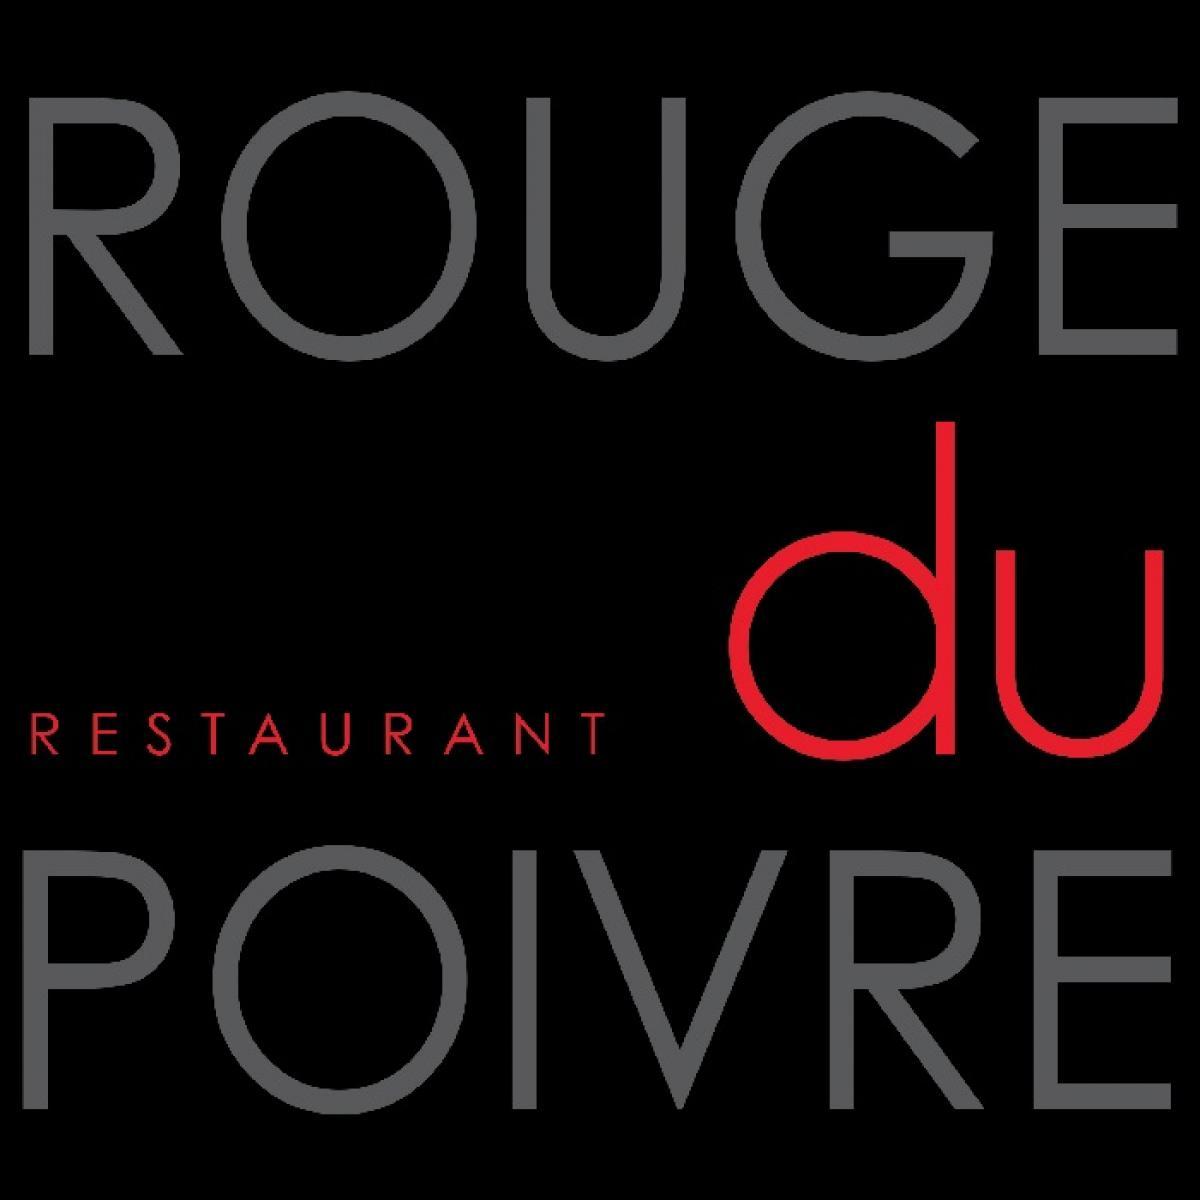 Restaurant Rouge du Poivre